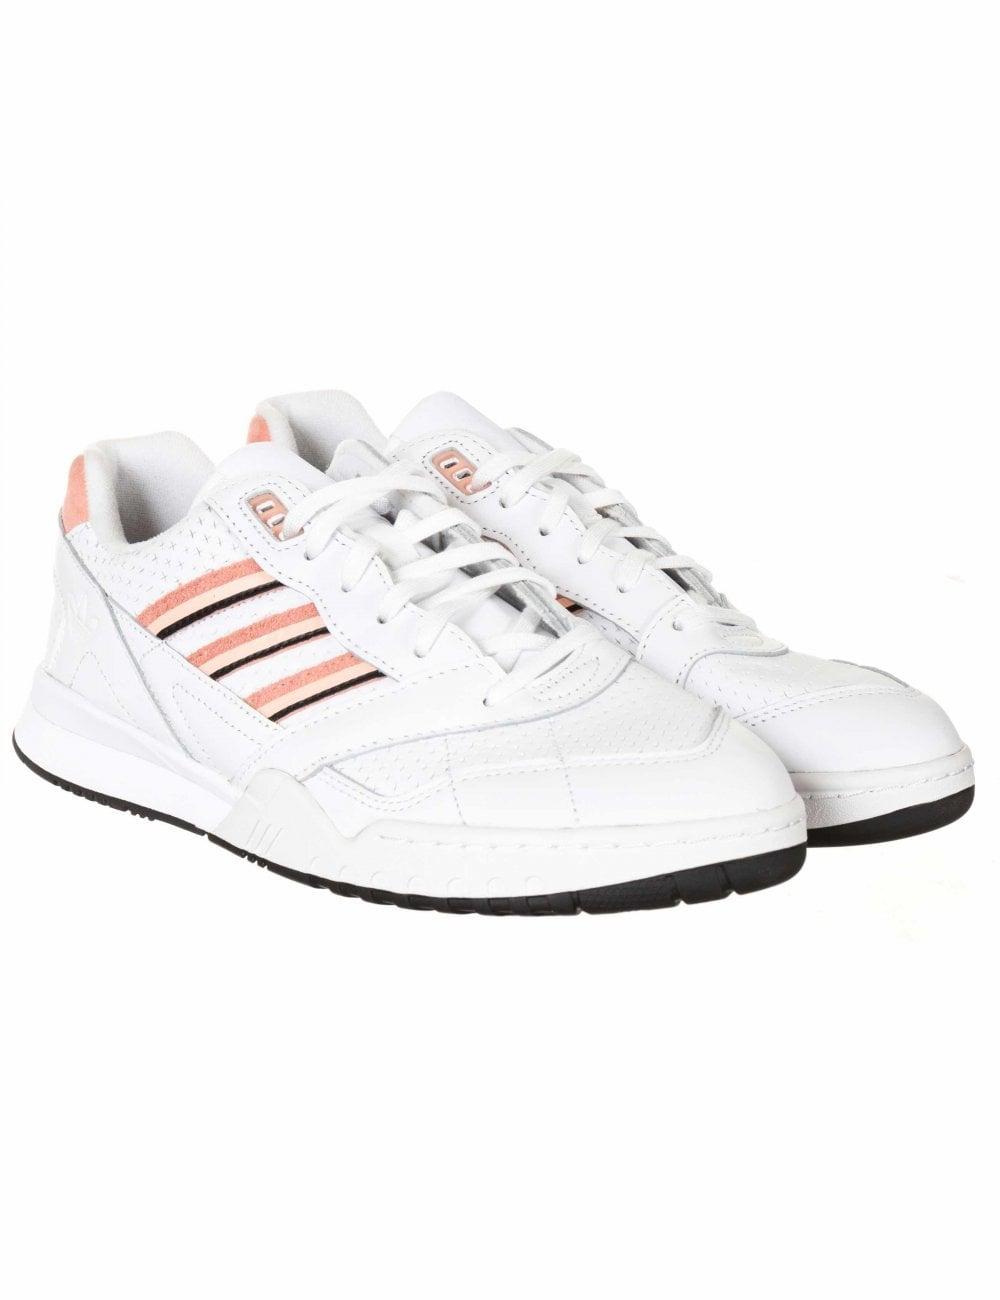 venta limitada mejor proveedor mejor valor Adidas Originals A.R. Trainers - Footwear White/Glow Pink ...